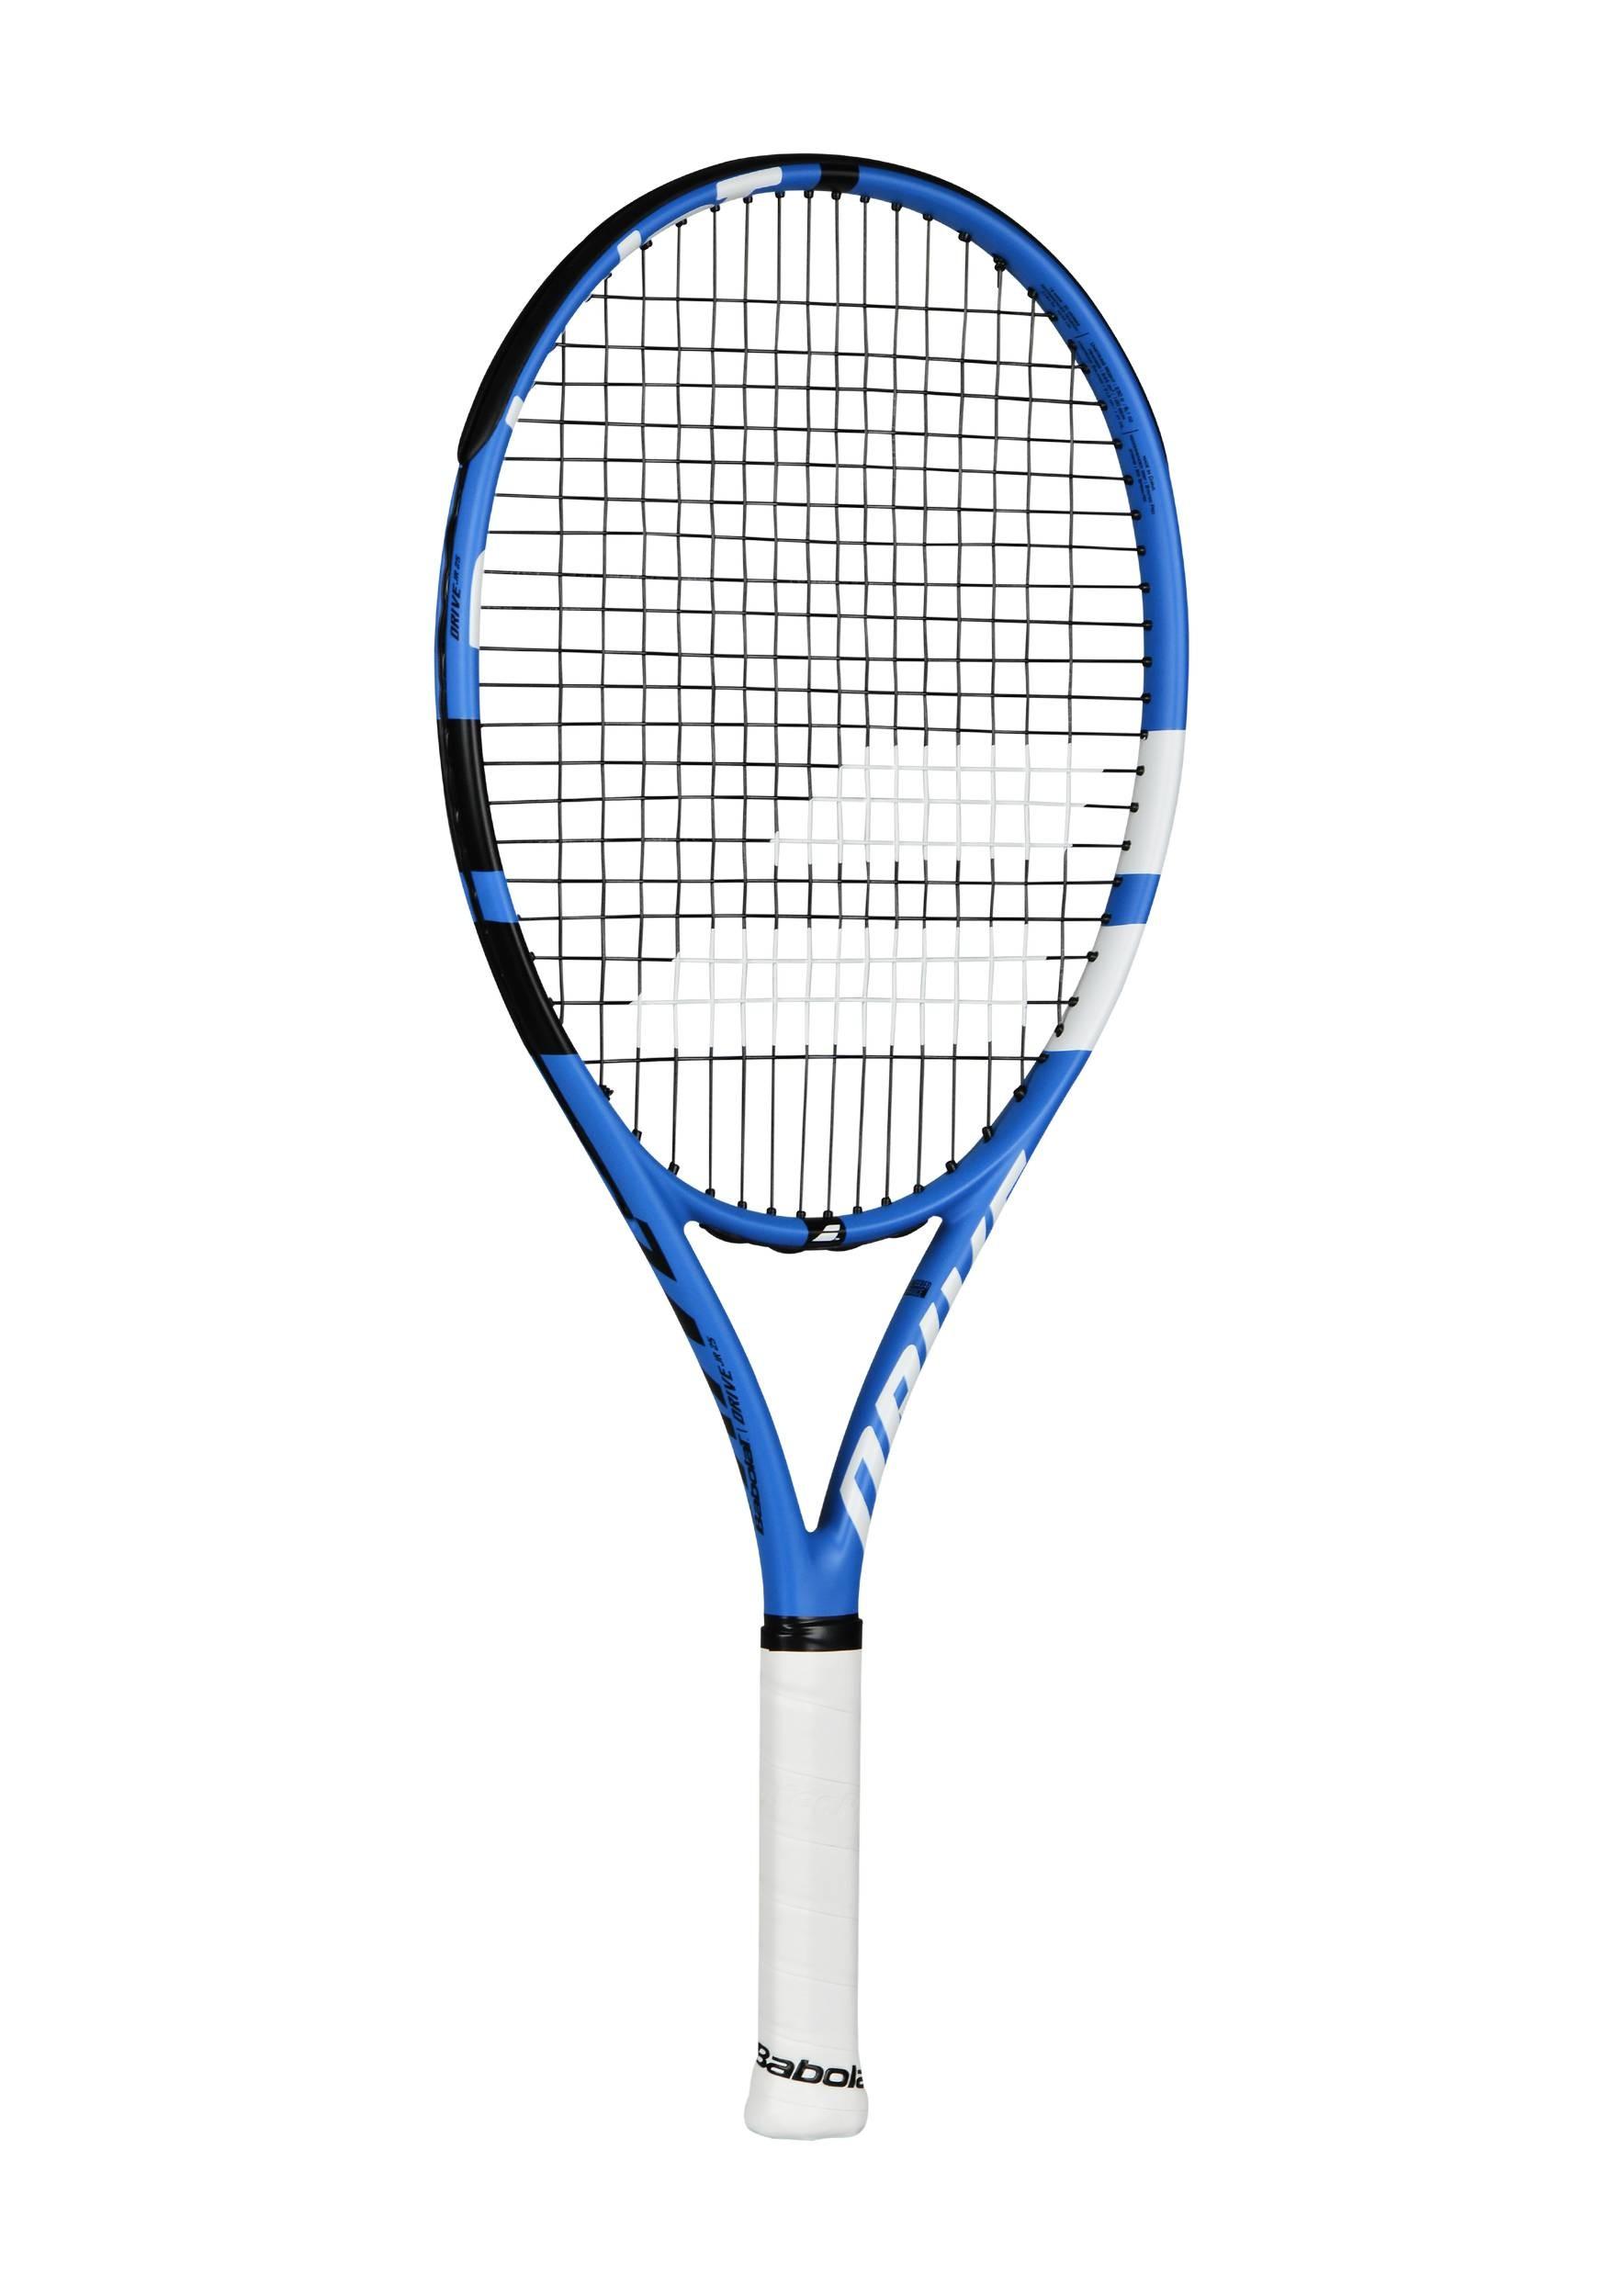 Rakieta tenisowa Babolat Drive Junior 25